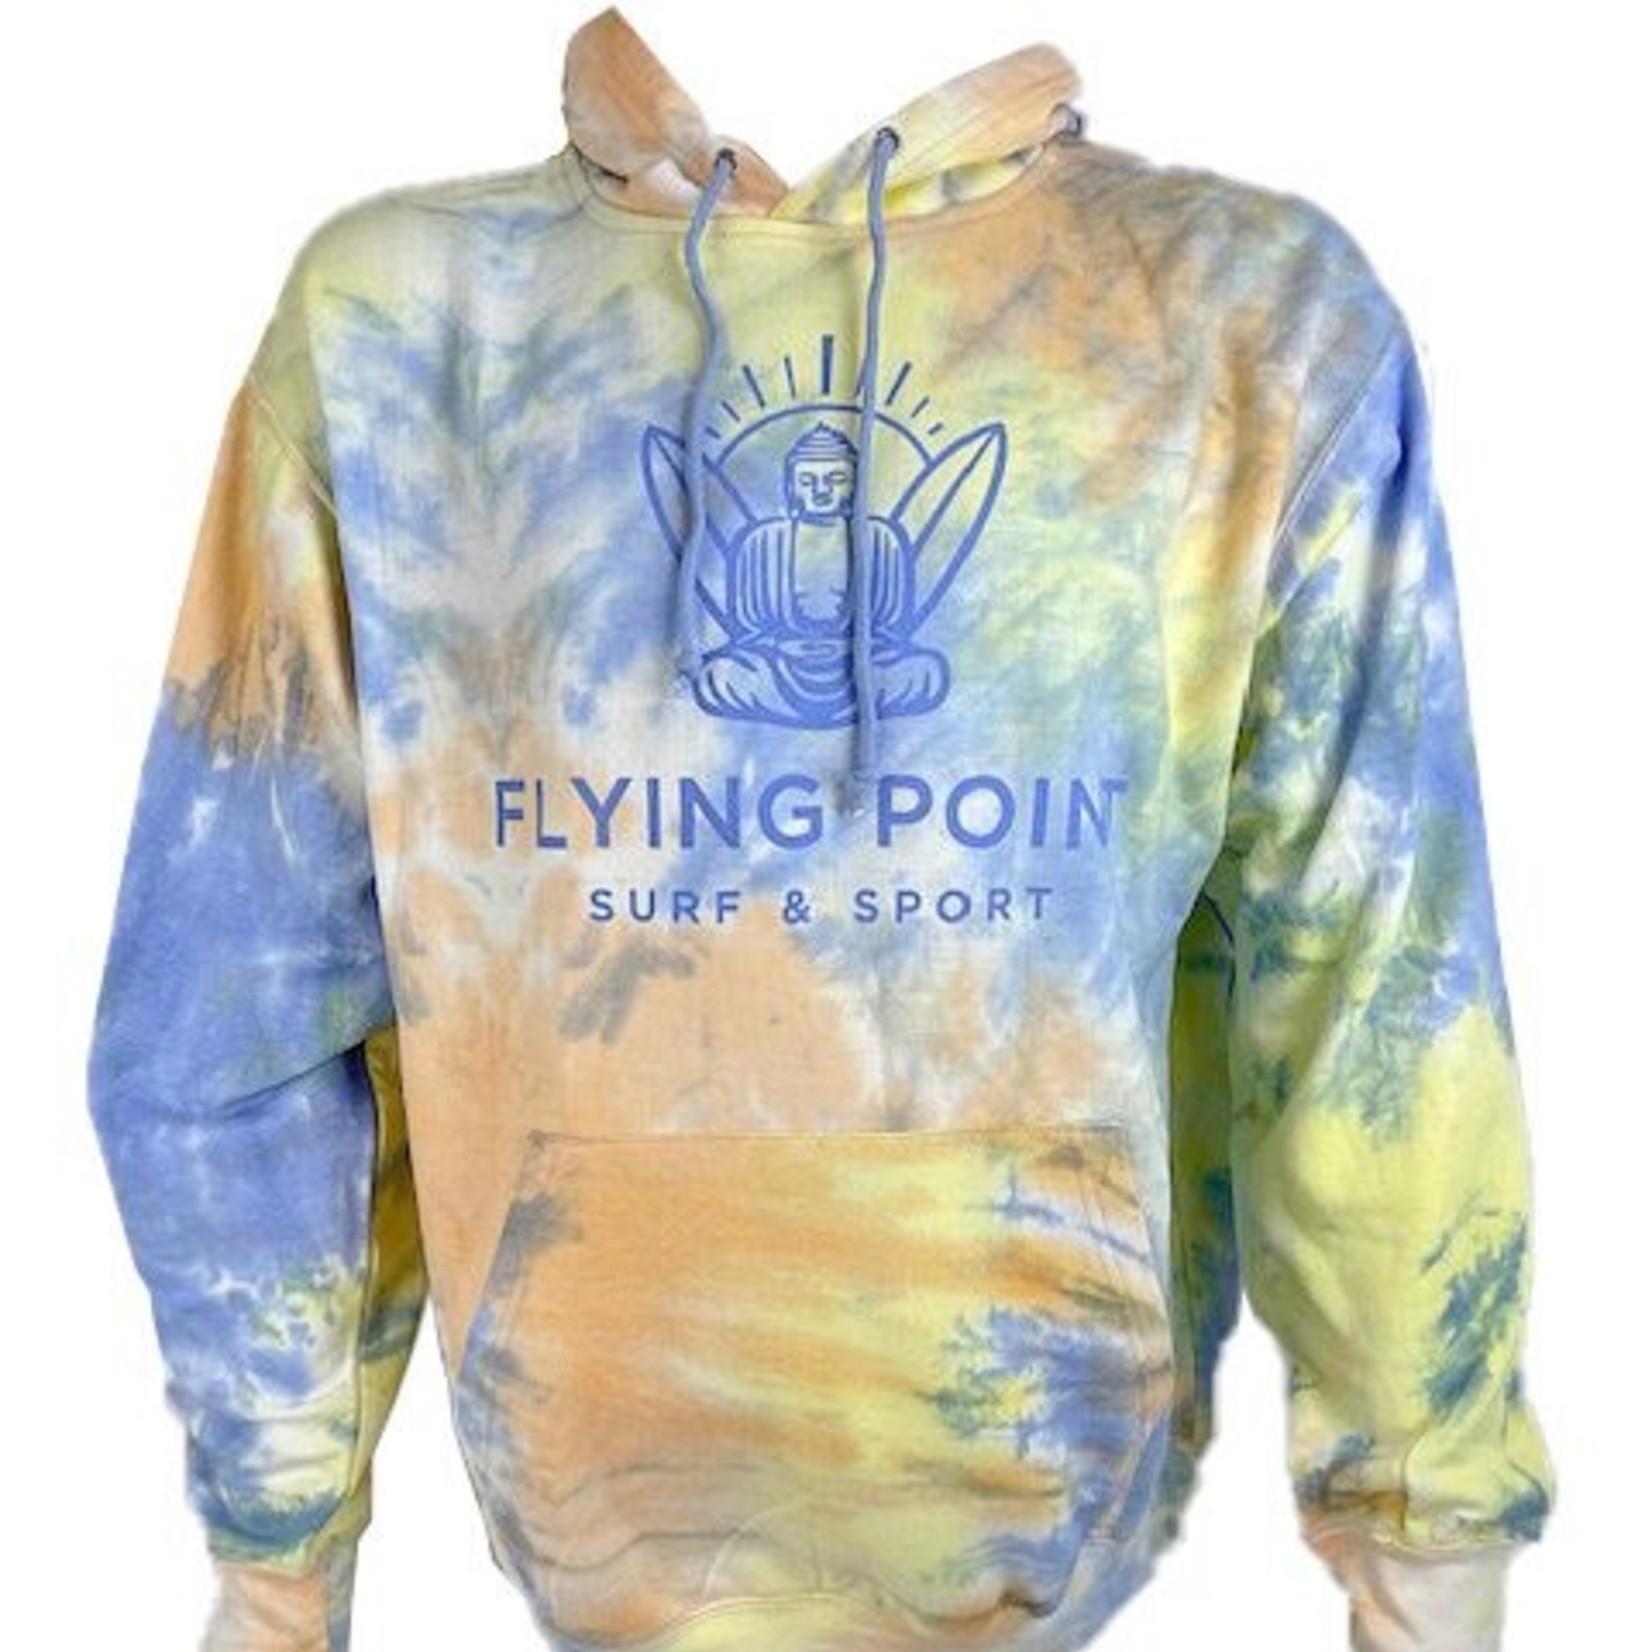 Flying Point Buddha Sunrise Tie Dye / Light Blue Sweatshirt